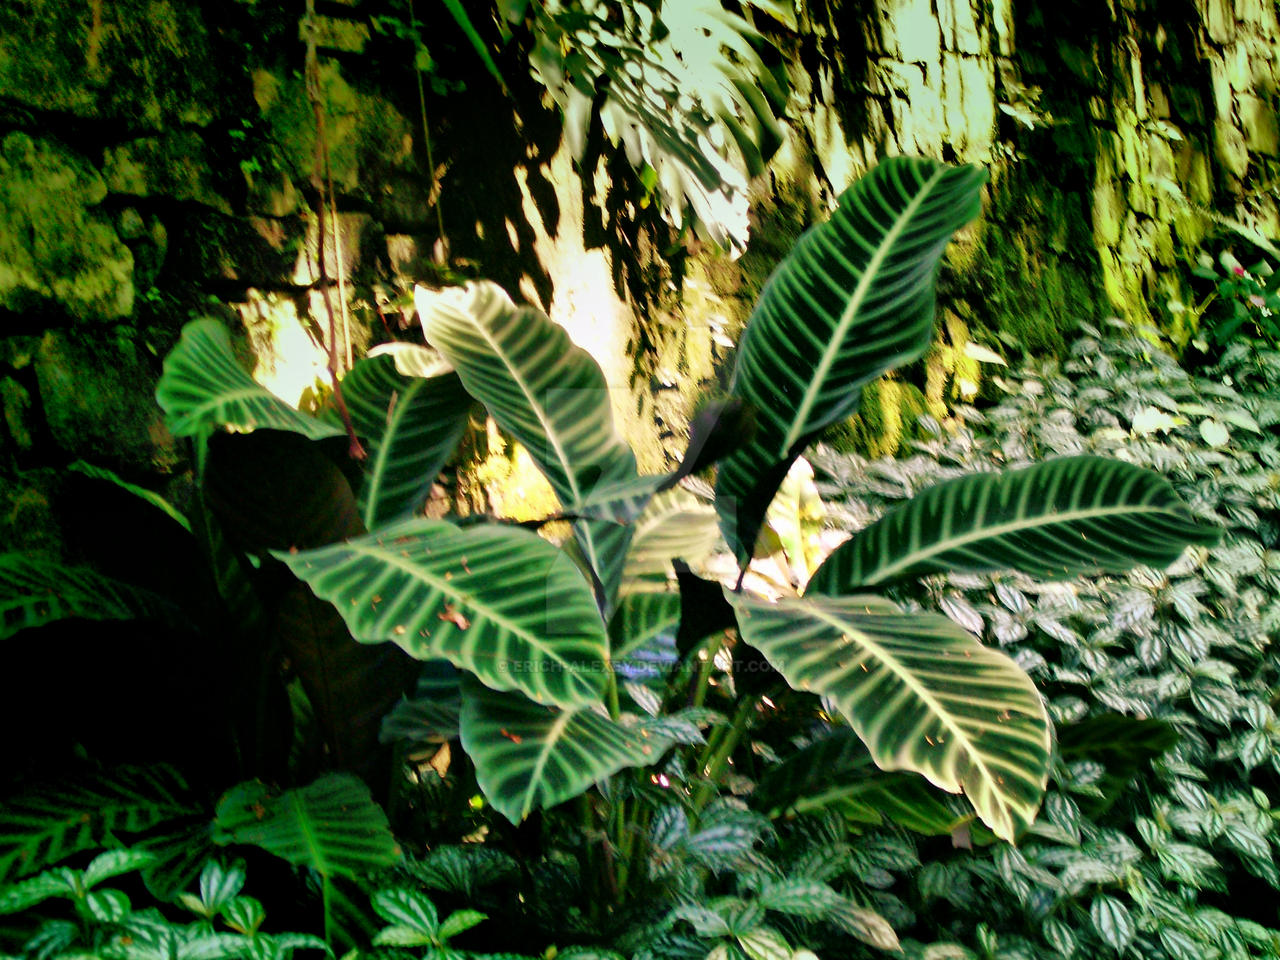 En el jardin de xilitla by erich alexey on deviantart for Jardin gally 78